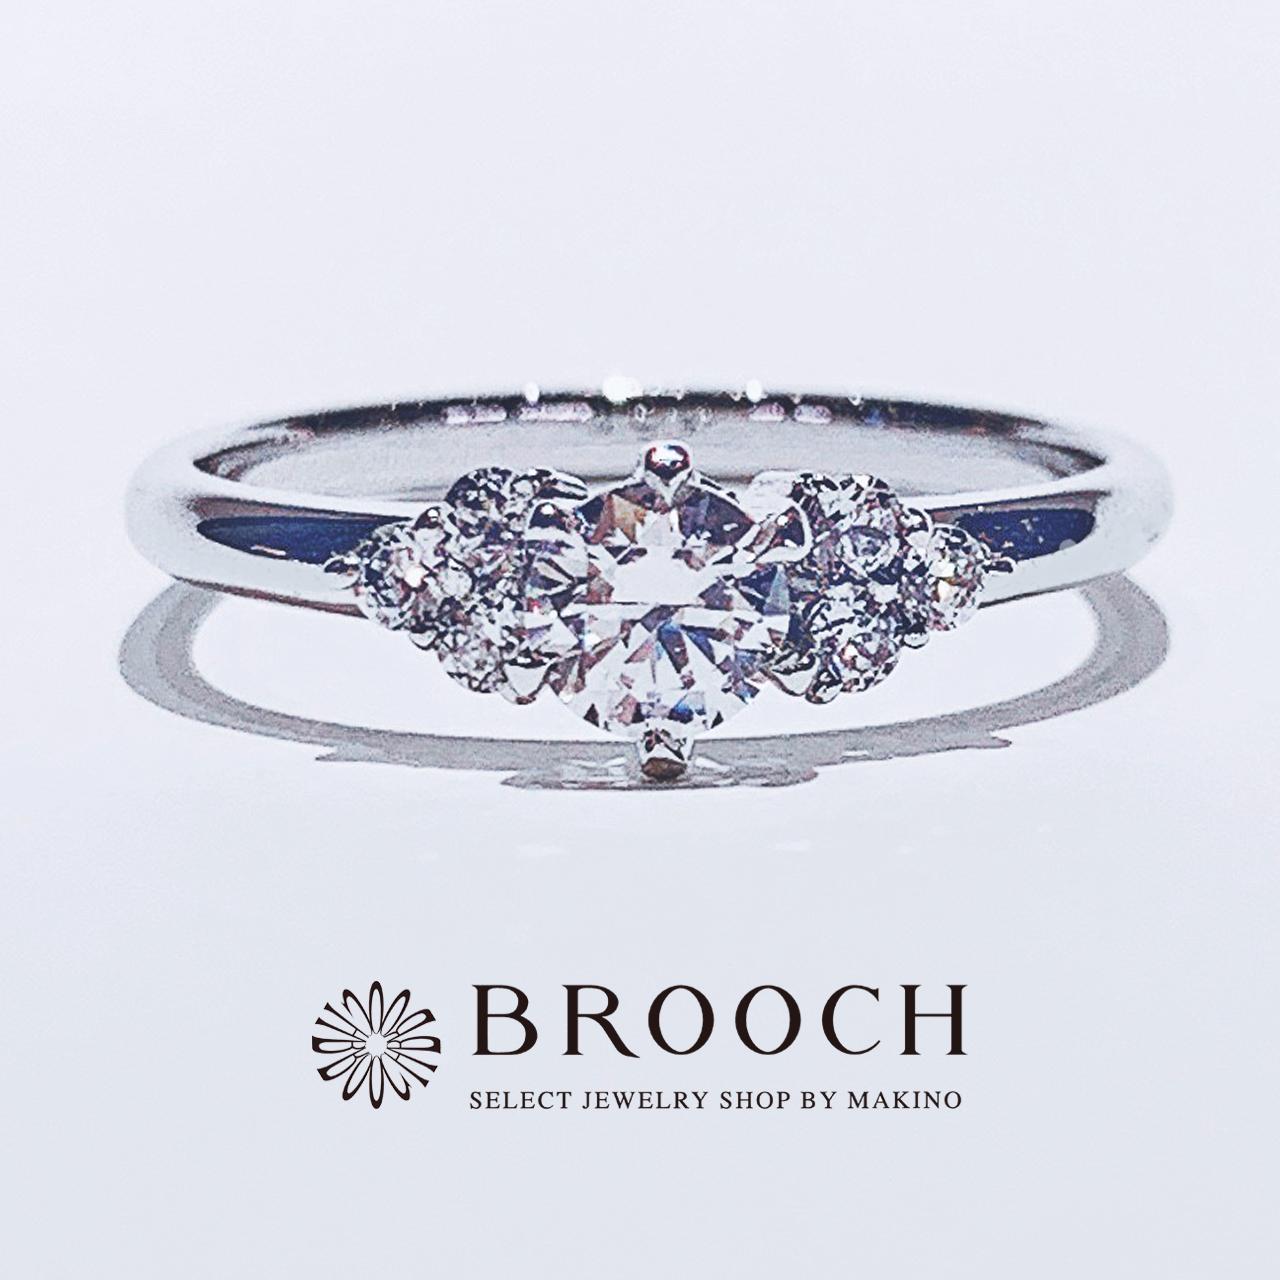 BROOCH 婚約指輪 エンゲージリング かわいい 両サイドメレストレートデザイン